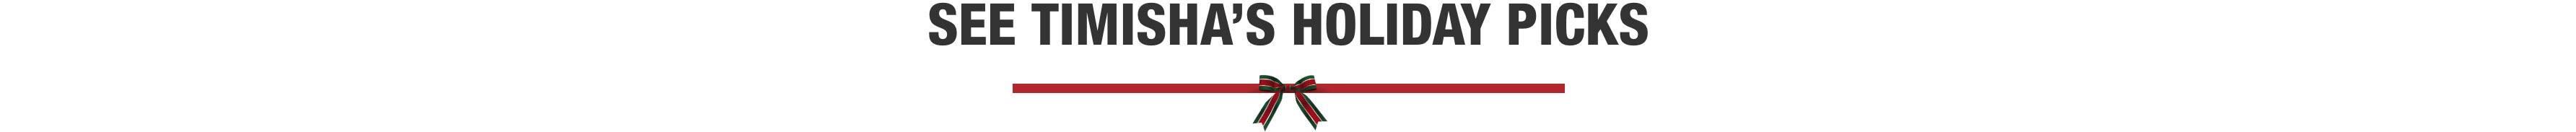 See Timisha's Holiday Picks